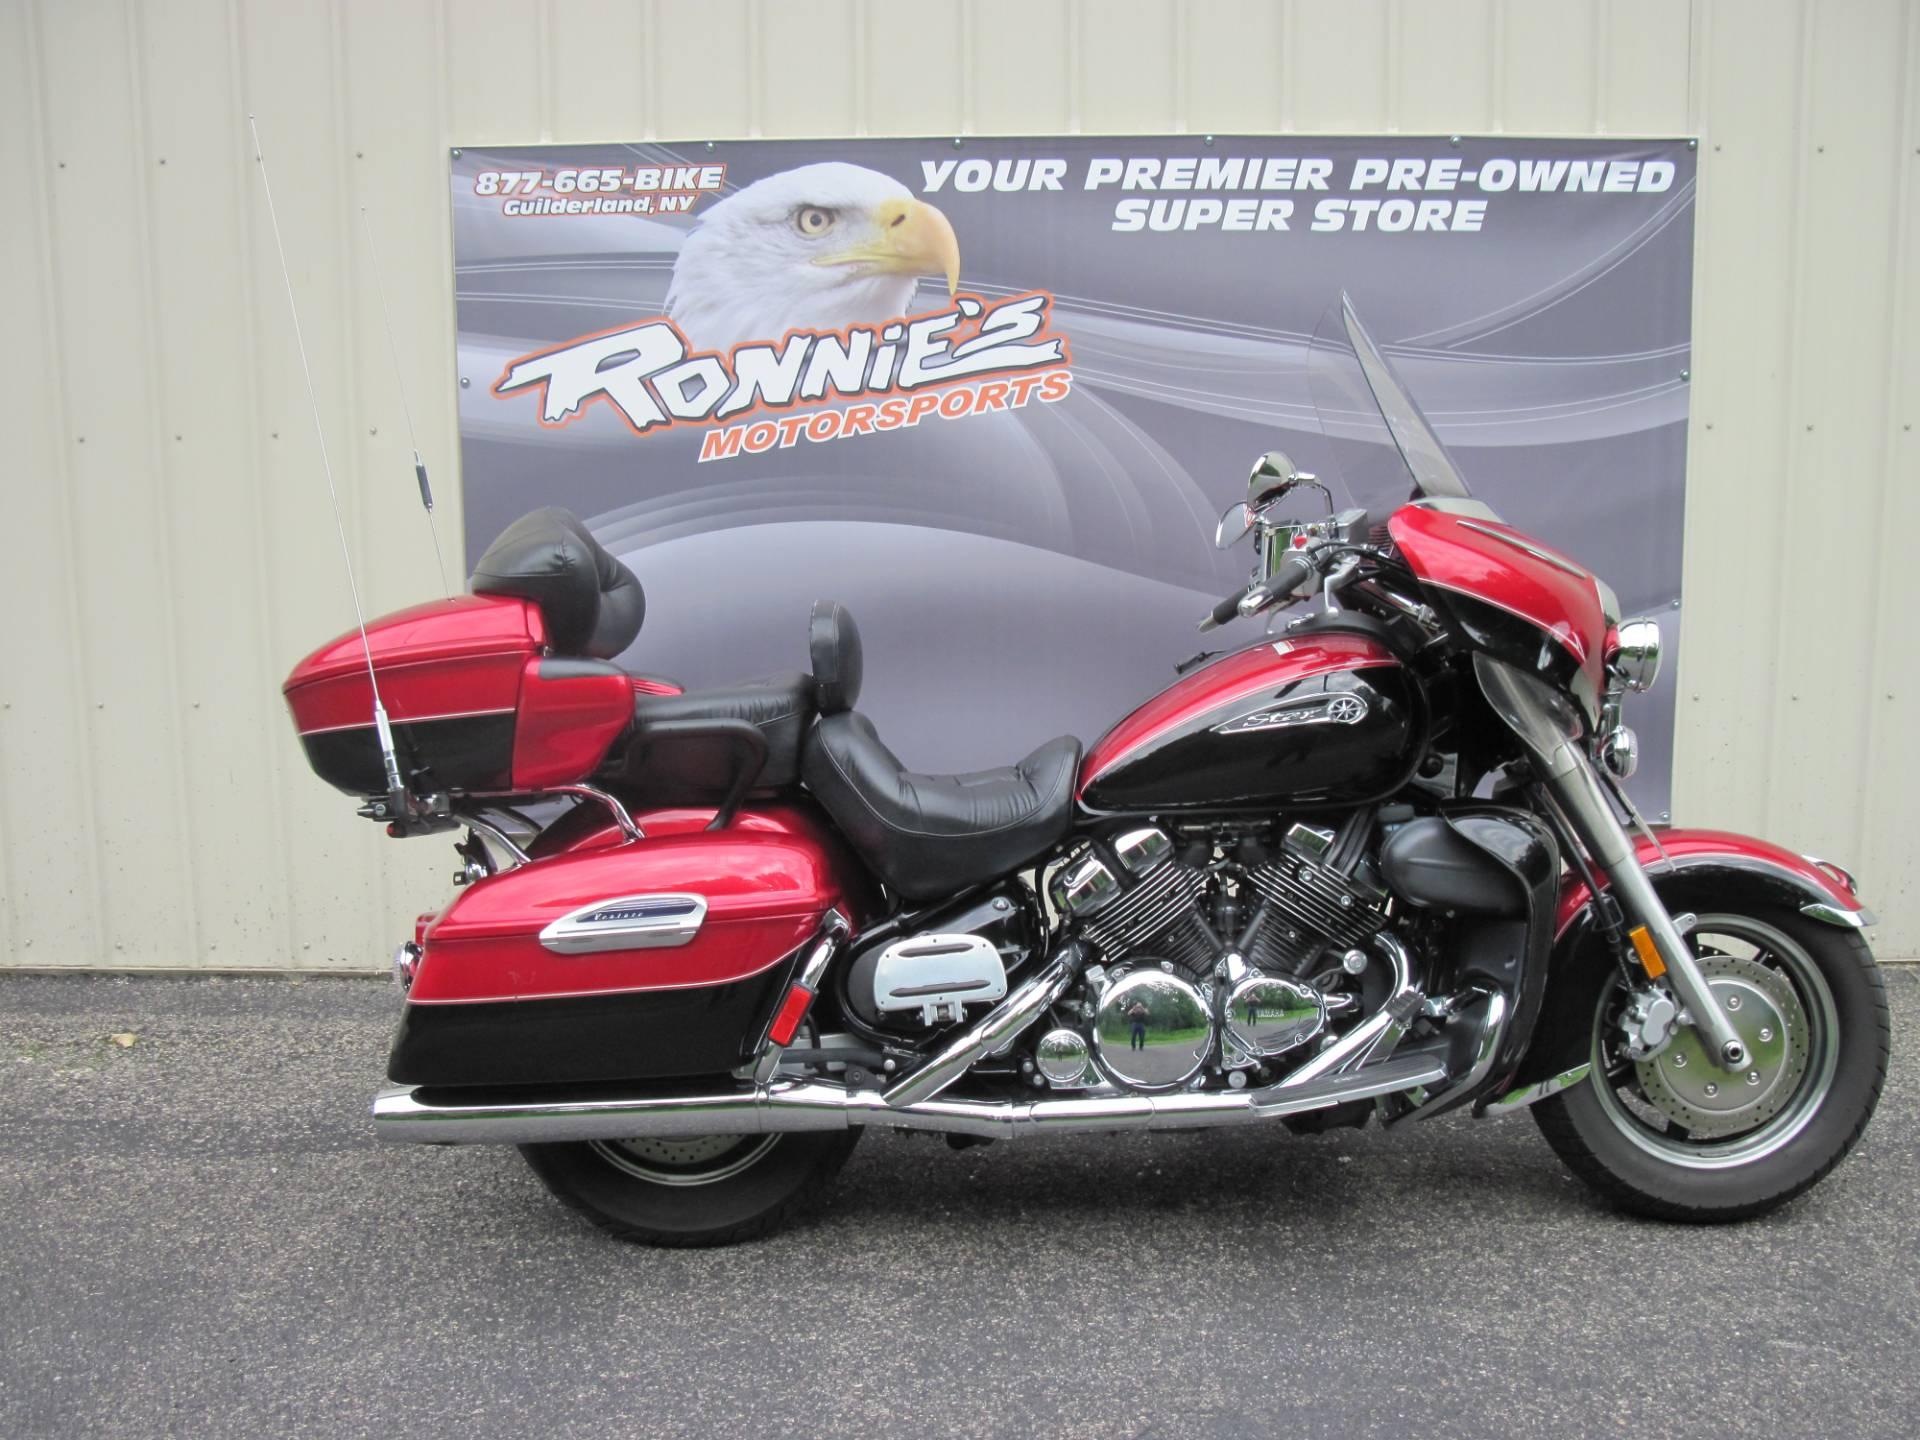 2009 Yamaha Royal Star Venture in Guilderland, New York - Photo 1